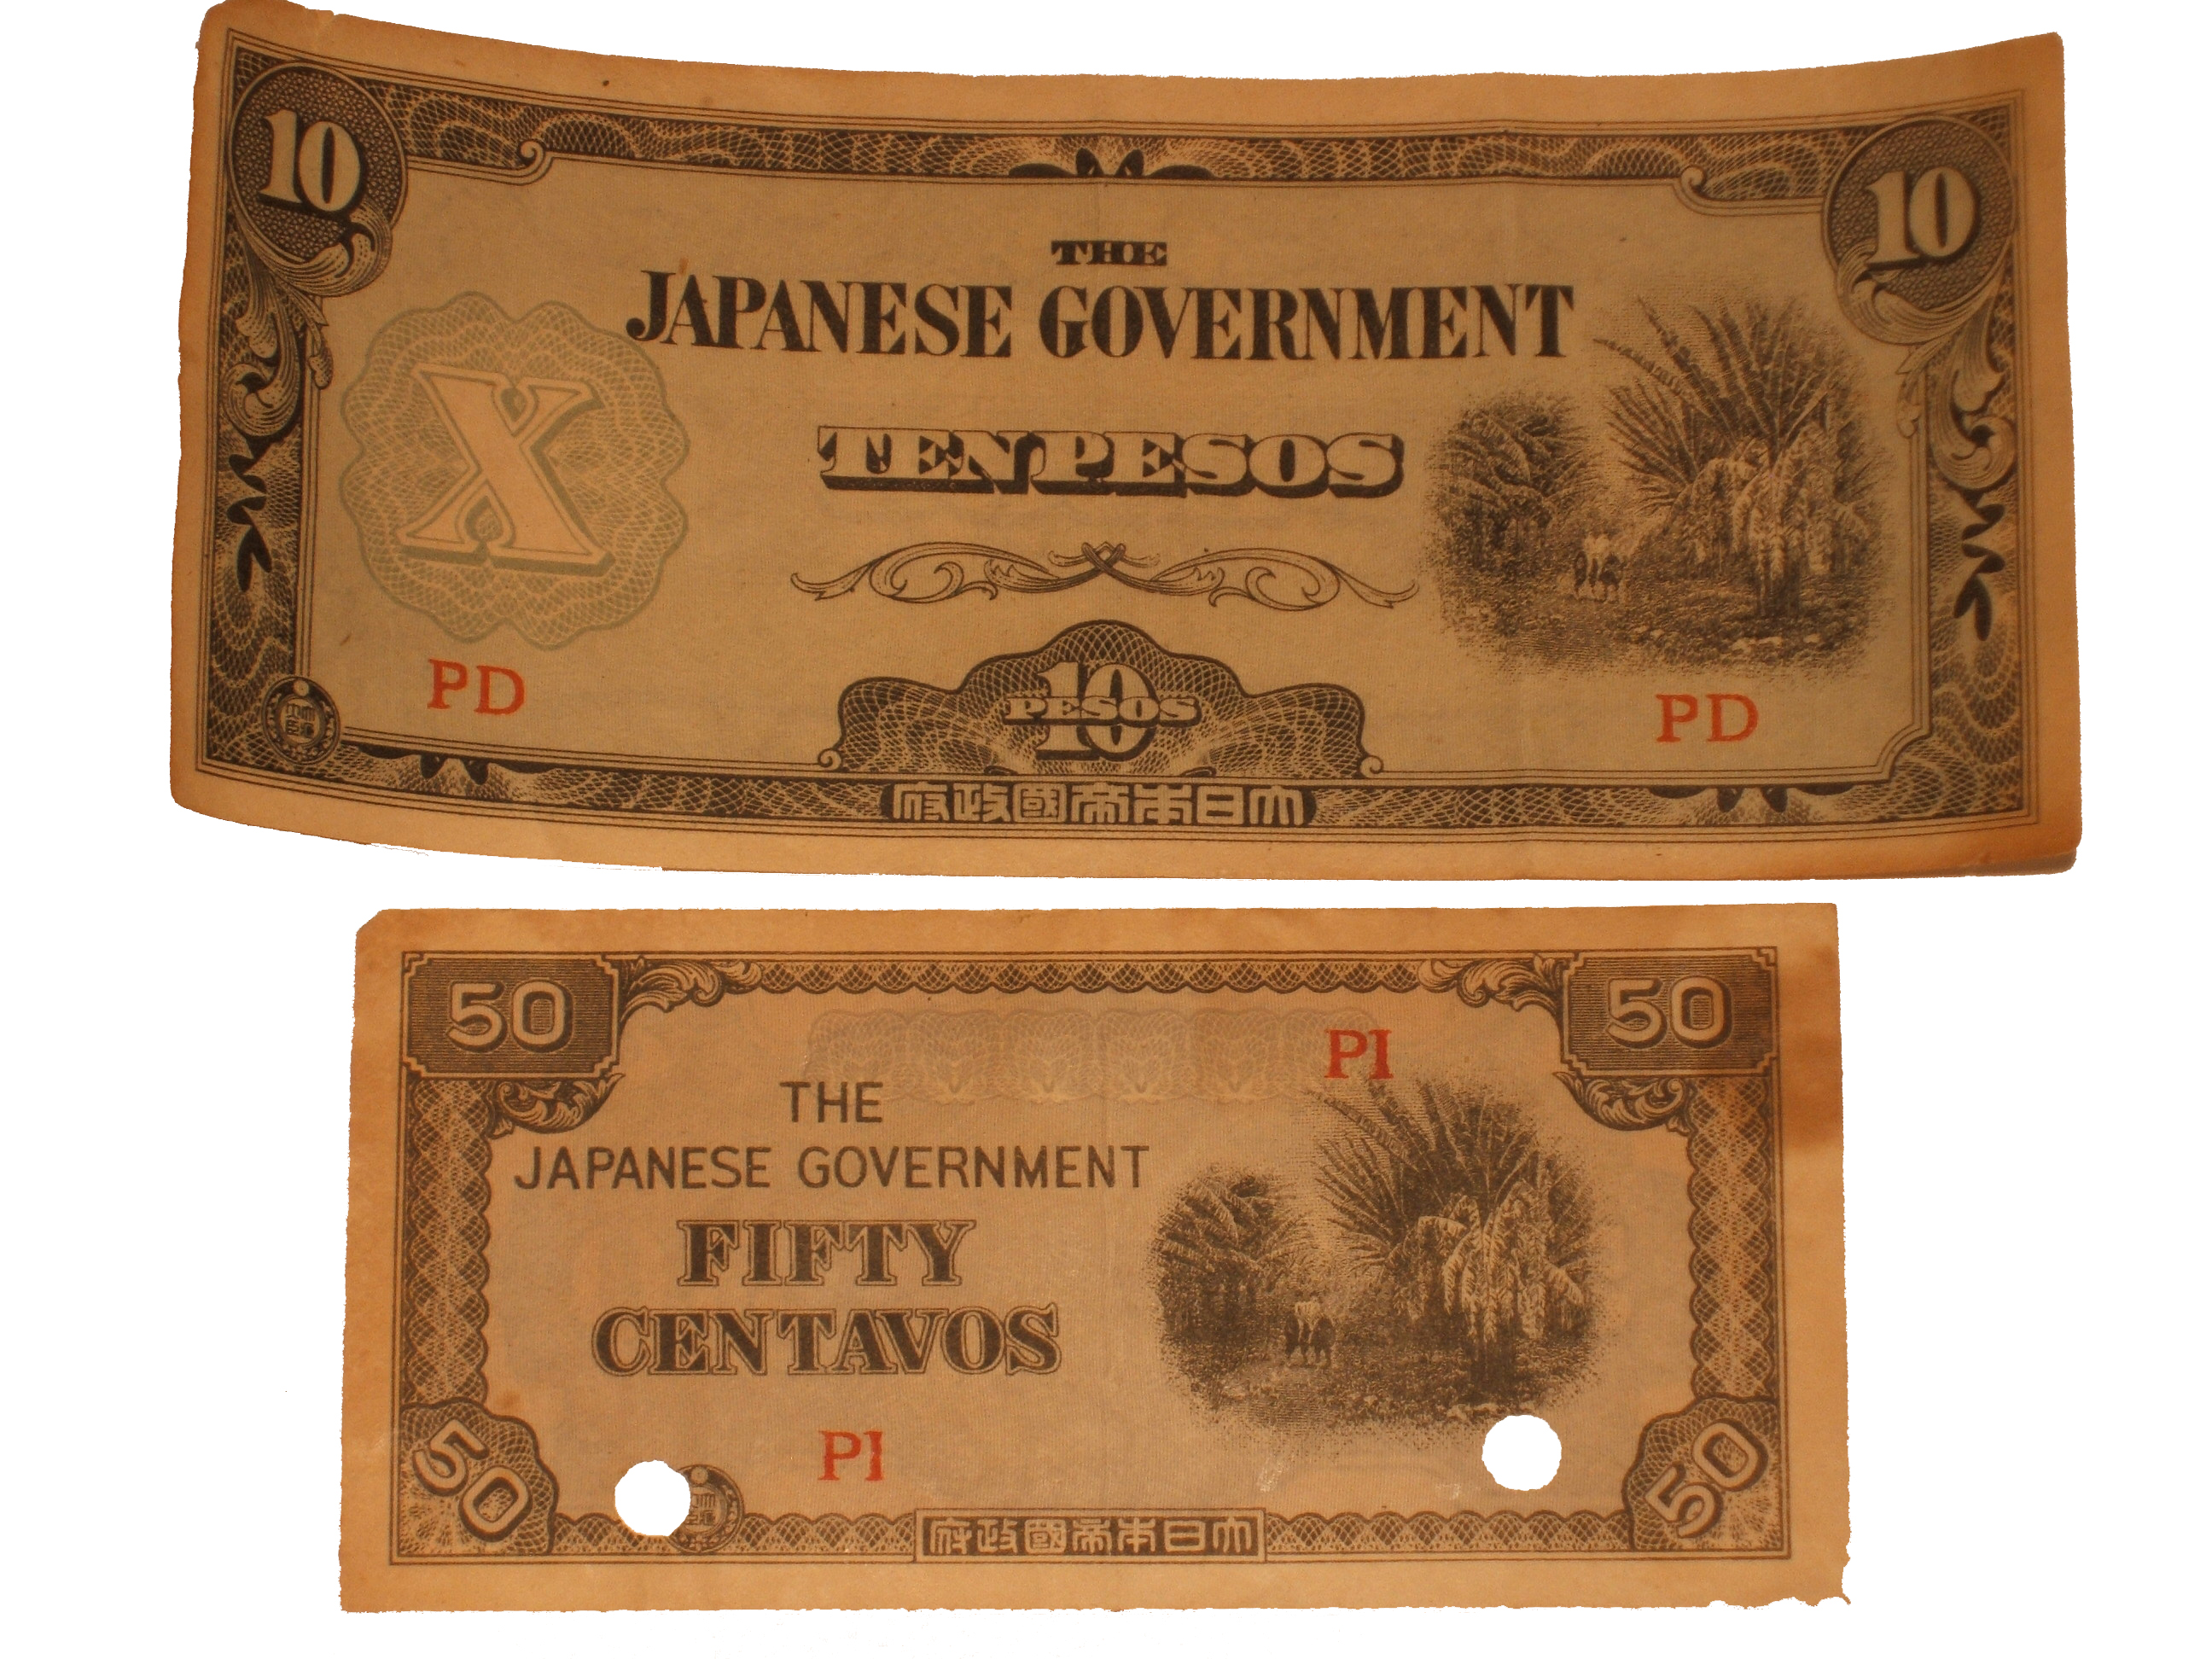 WWII-era Japanese Philippines Occupation Money